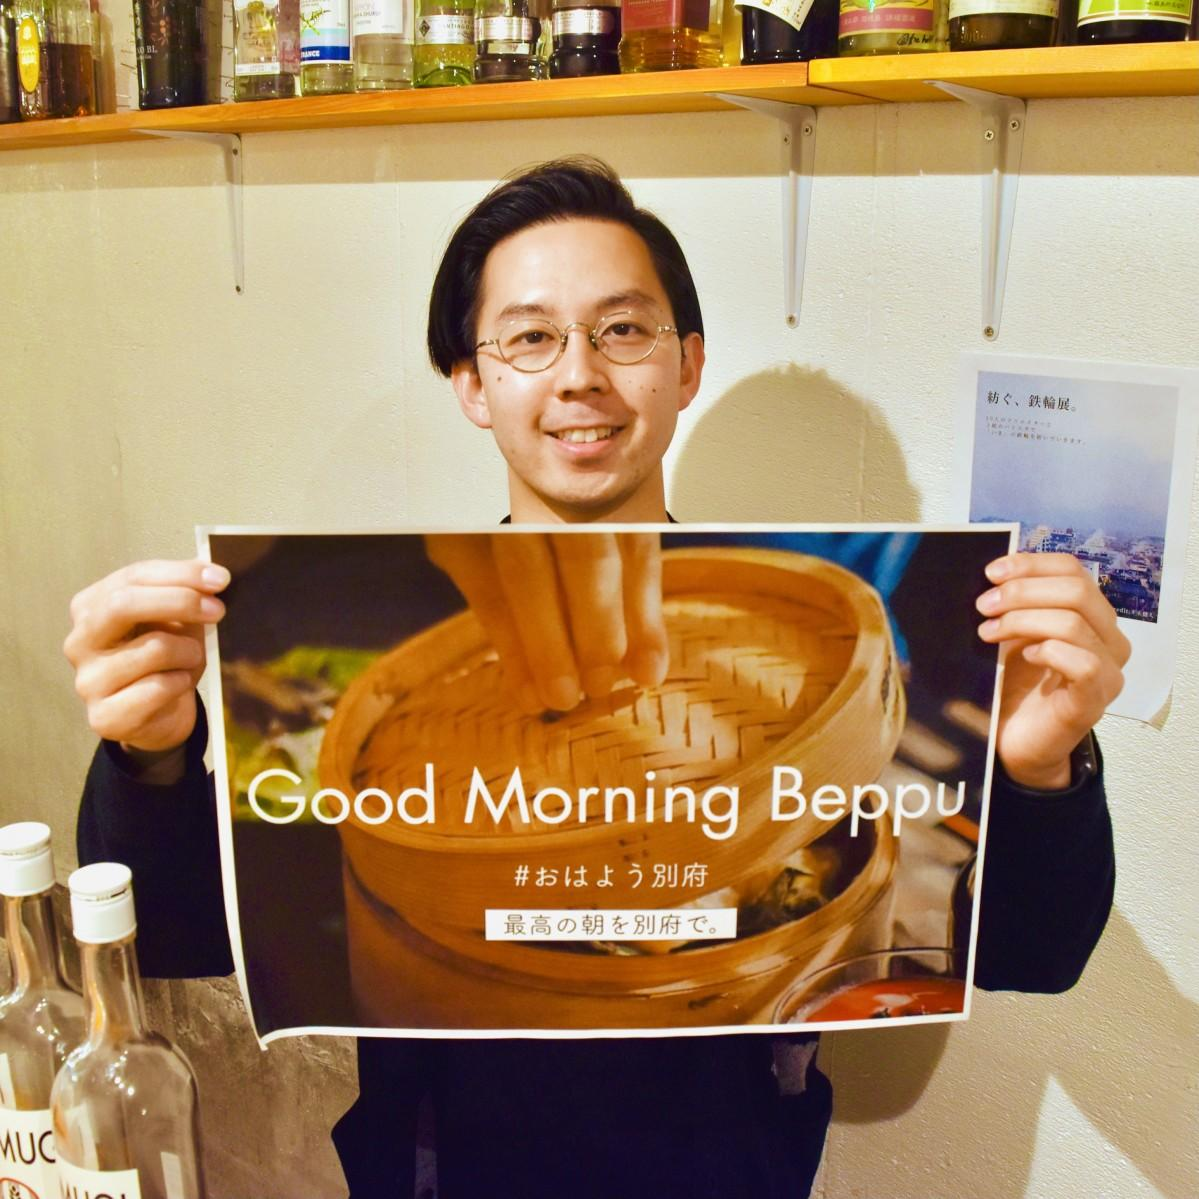 「Good Morning Beppu」の利用を呼び掛ける深川さん